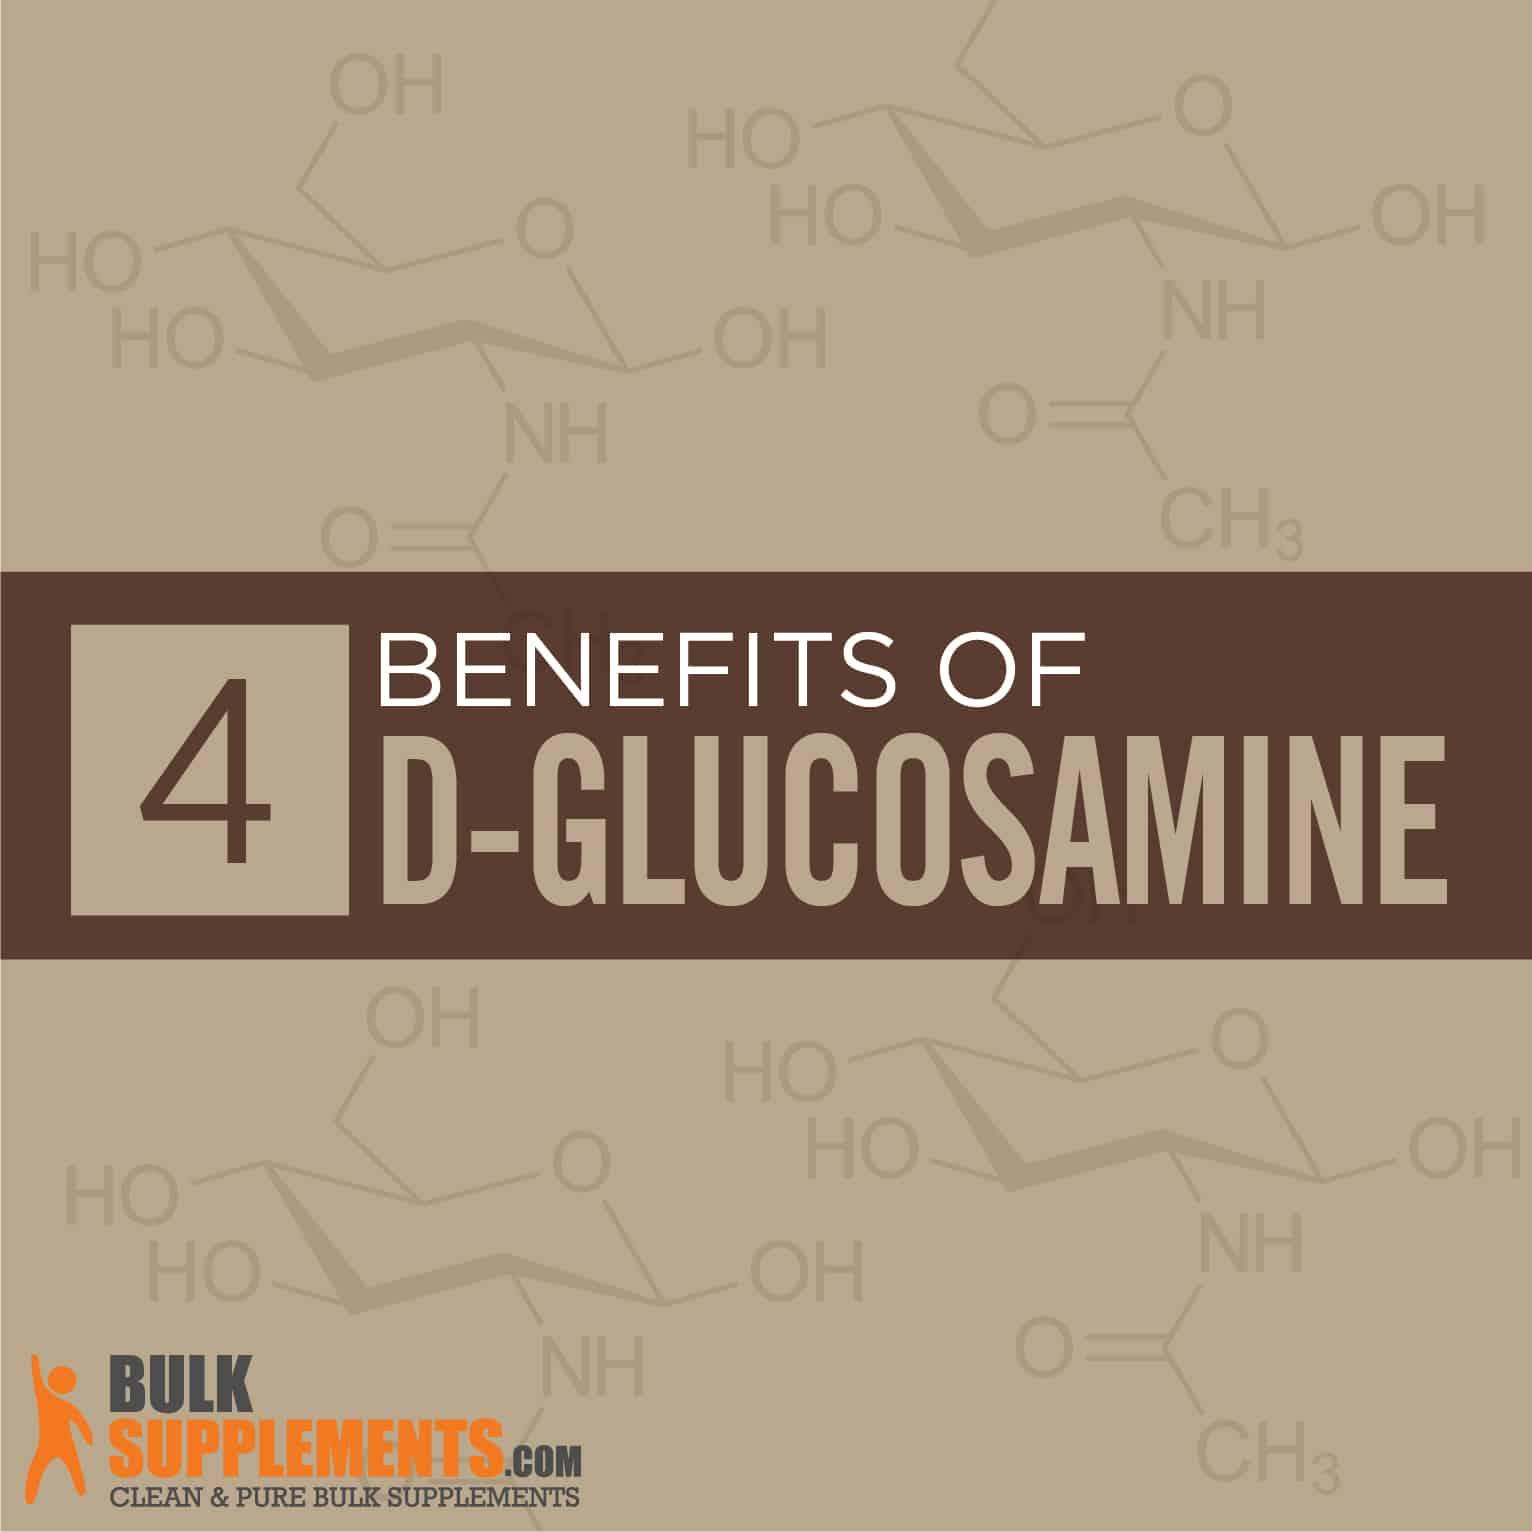 D-Glucosamine